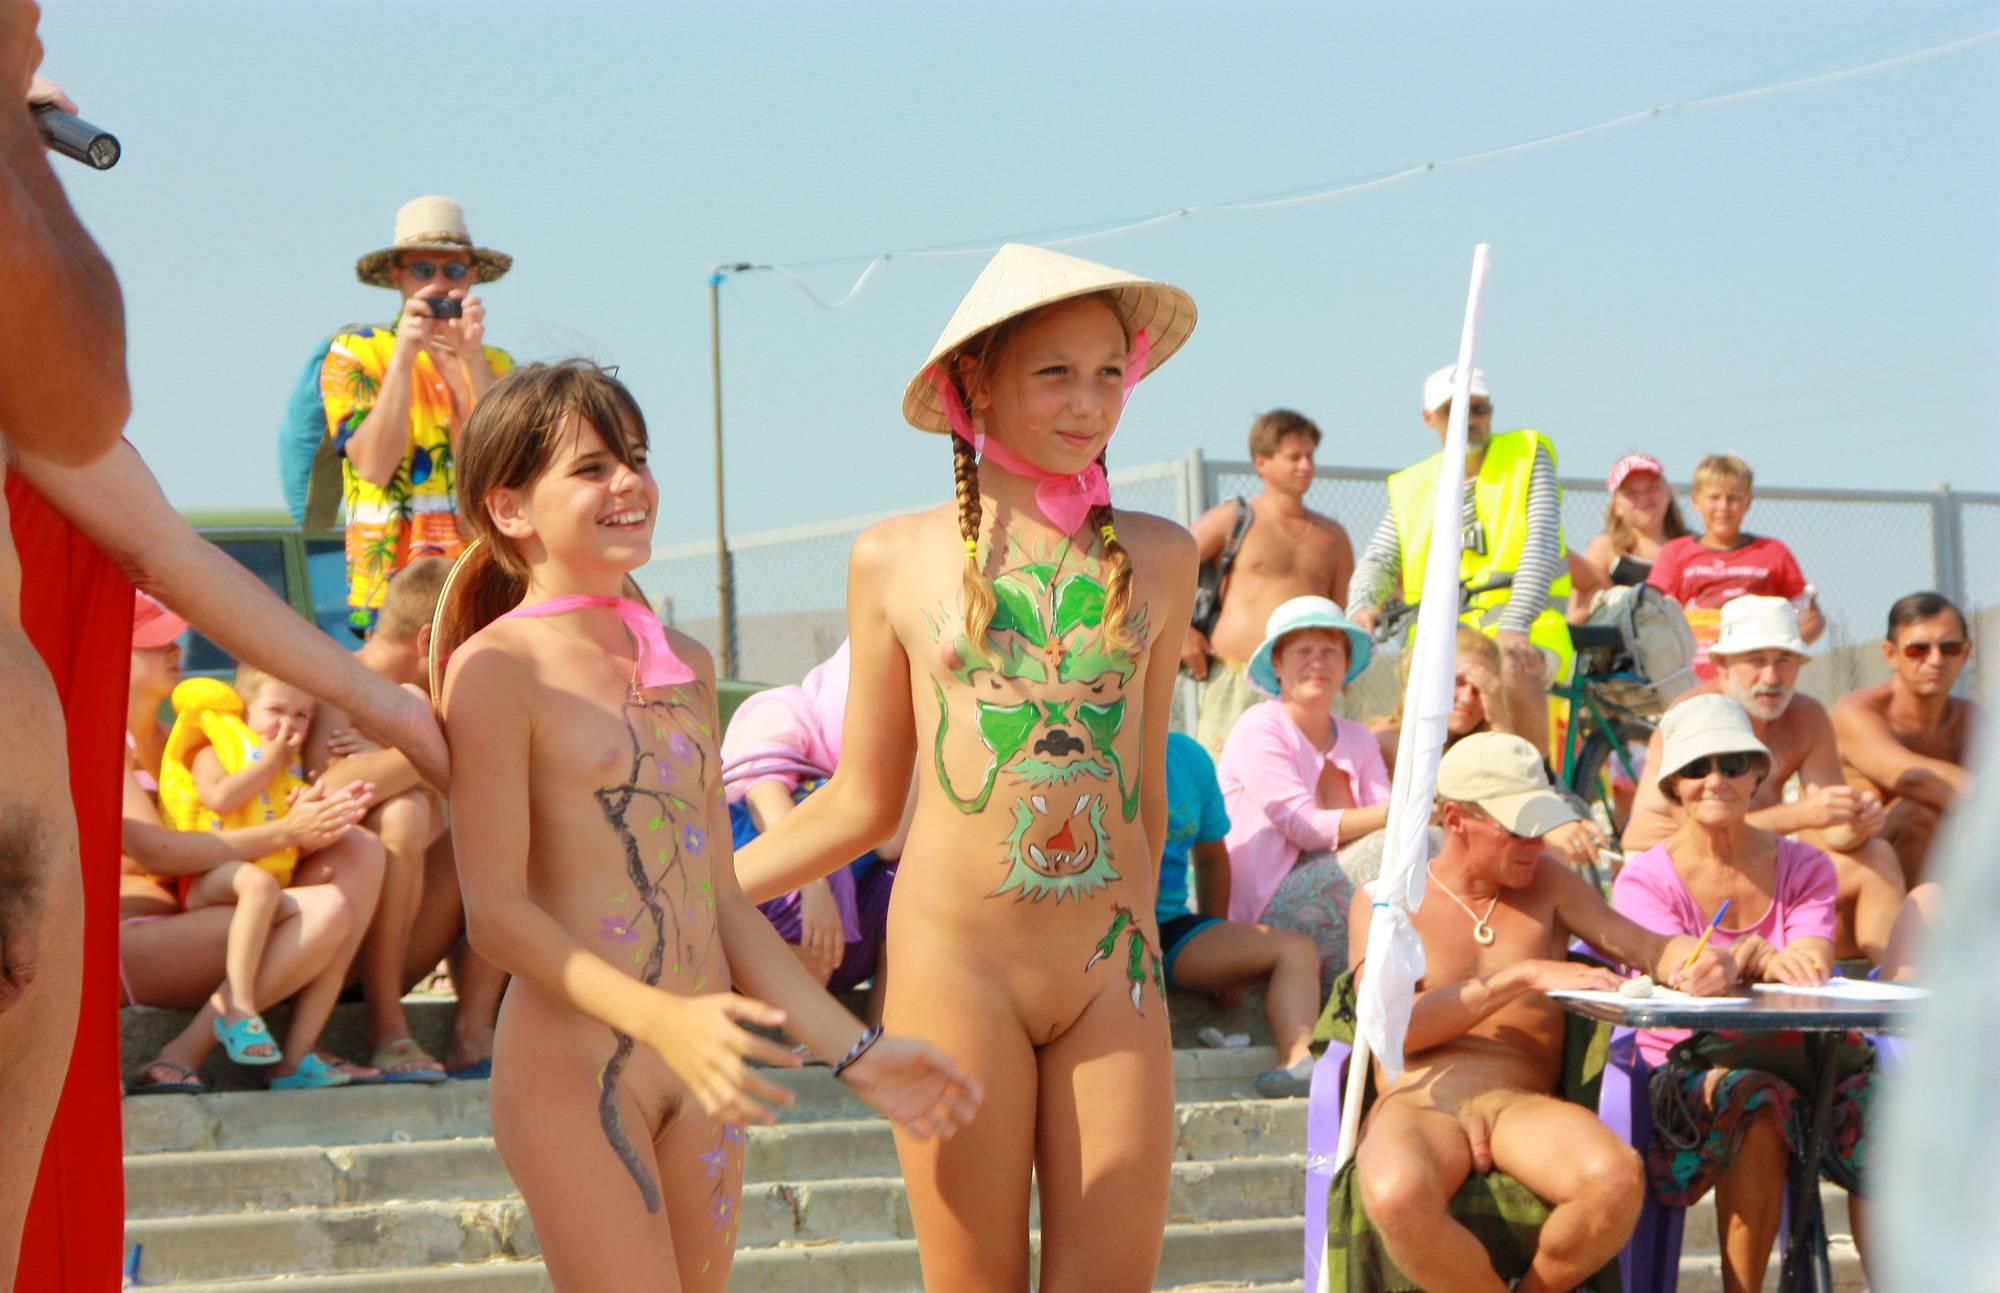 Nudist Gallery Neptune Nudist Event Win - 1